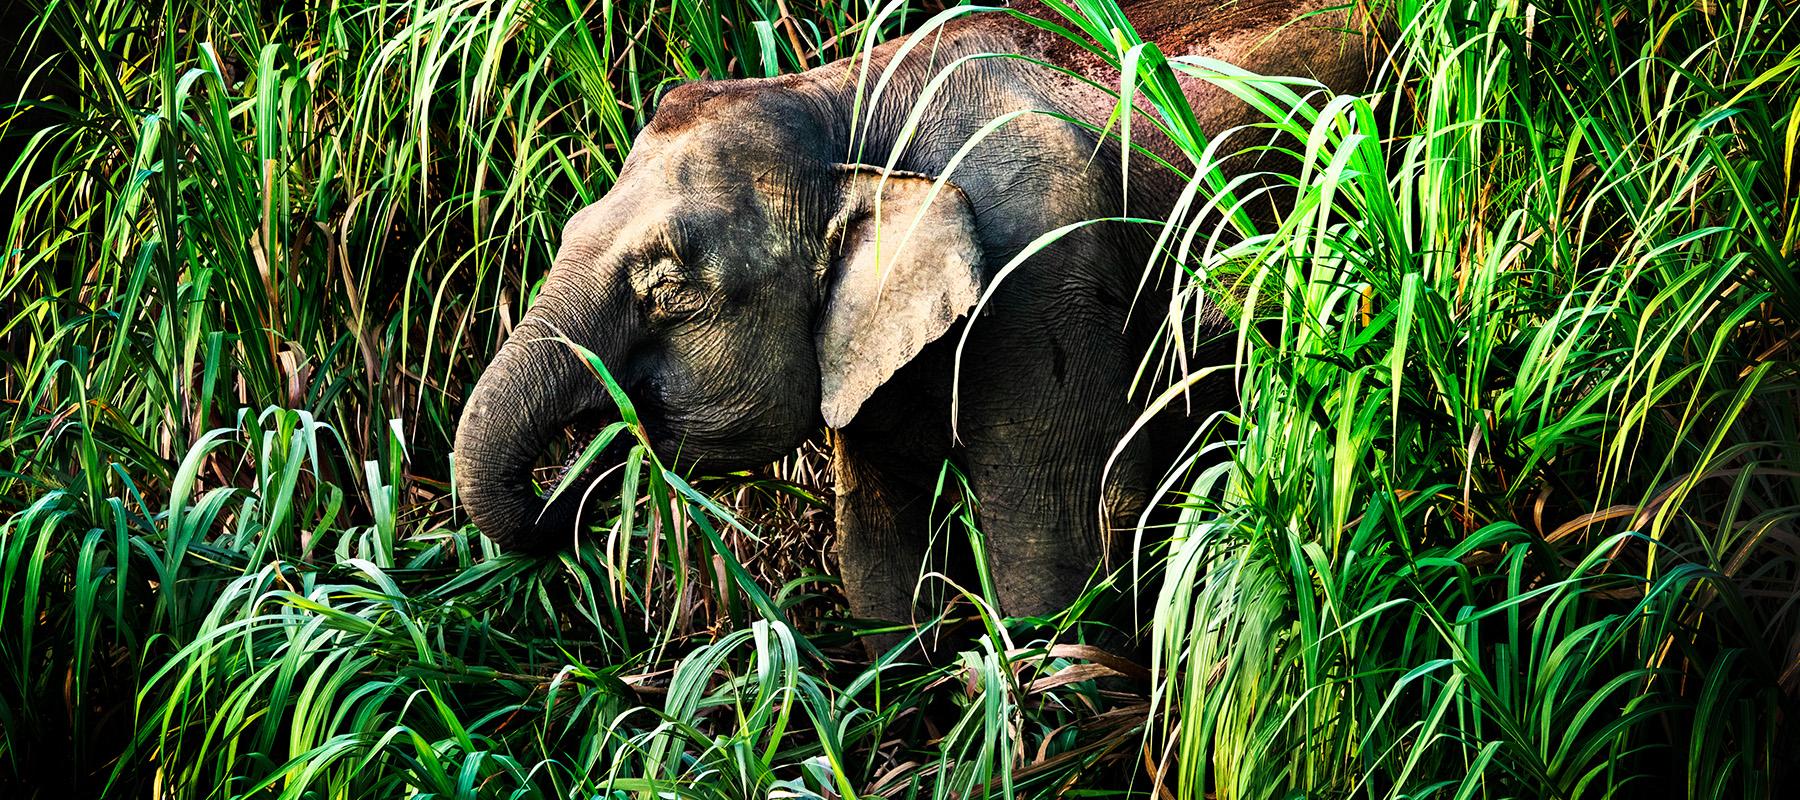 Borneo, skogselefanter, regnskog, safari, djur, kinabatangan river, malaysia